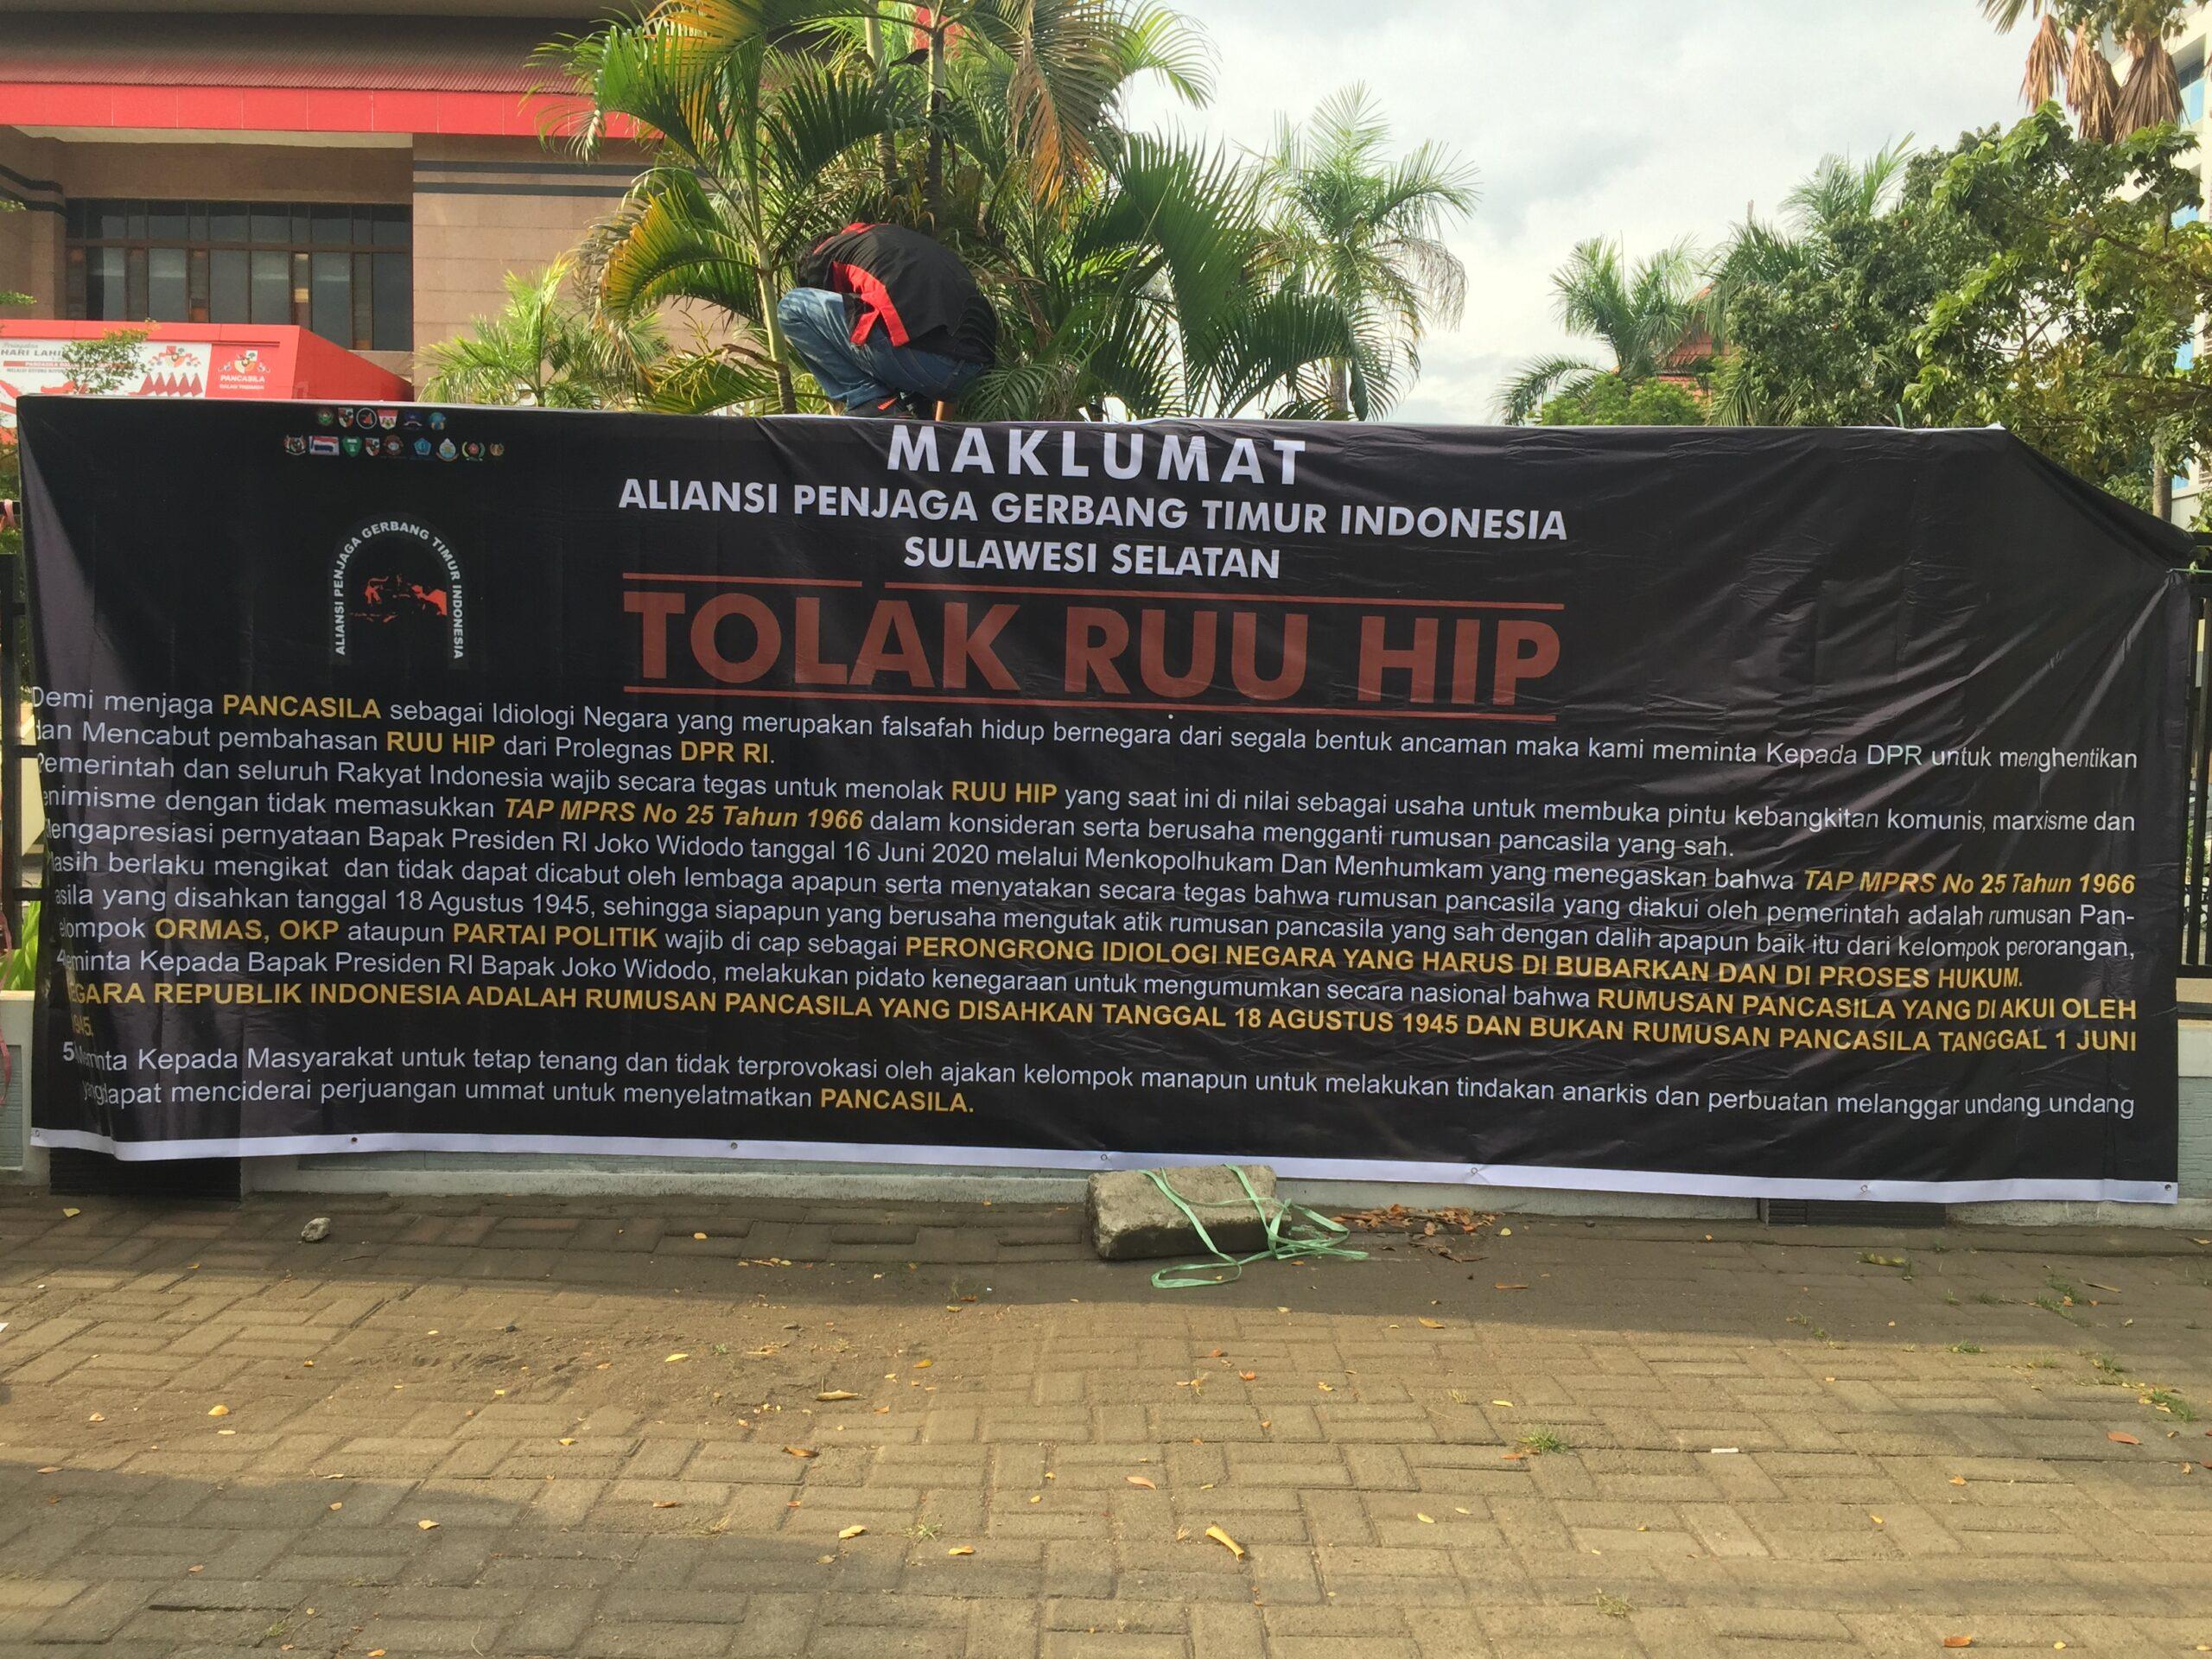 APEGTI Bentangkan Spanduk Penolakan Pengesahan RUU HIP di Gedung DPRD Provinsi Sulawesi Selatan, jum'at (3/7/2020)